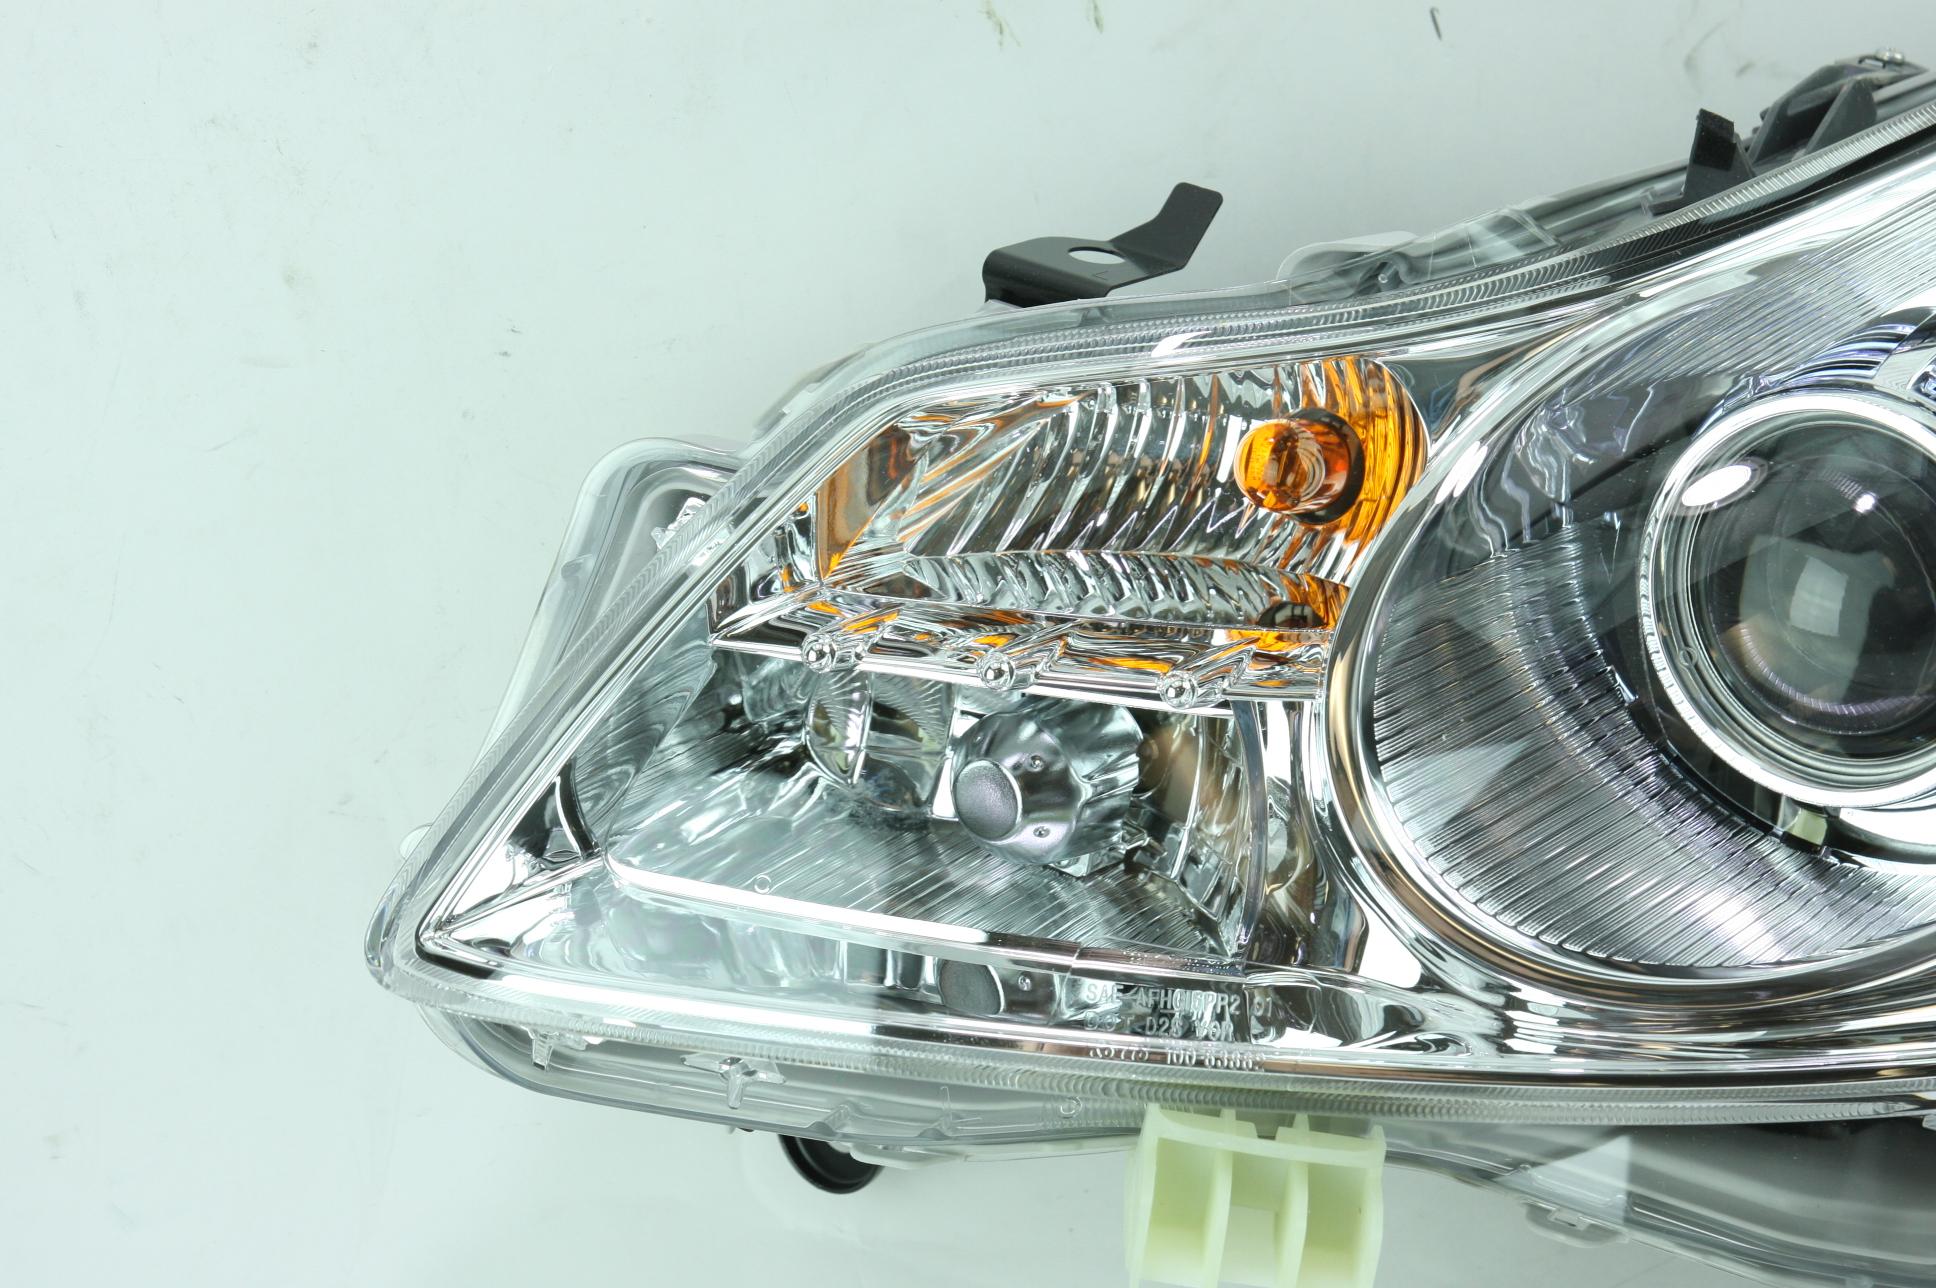 * Infiniti G37 Sedan Headlight LH Driver Side Genuine Nissan OEM 26060JK60E New - image 3